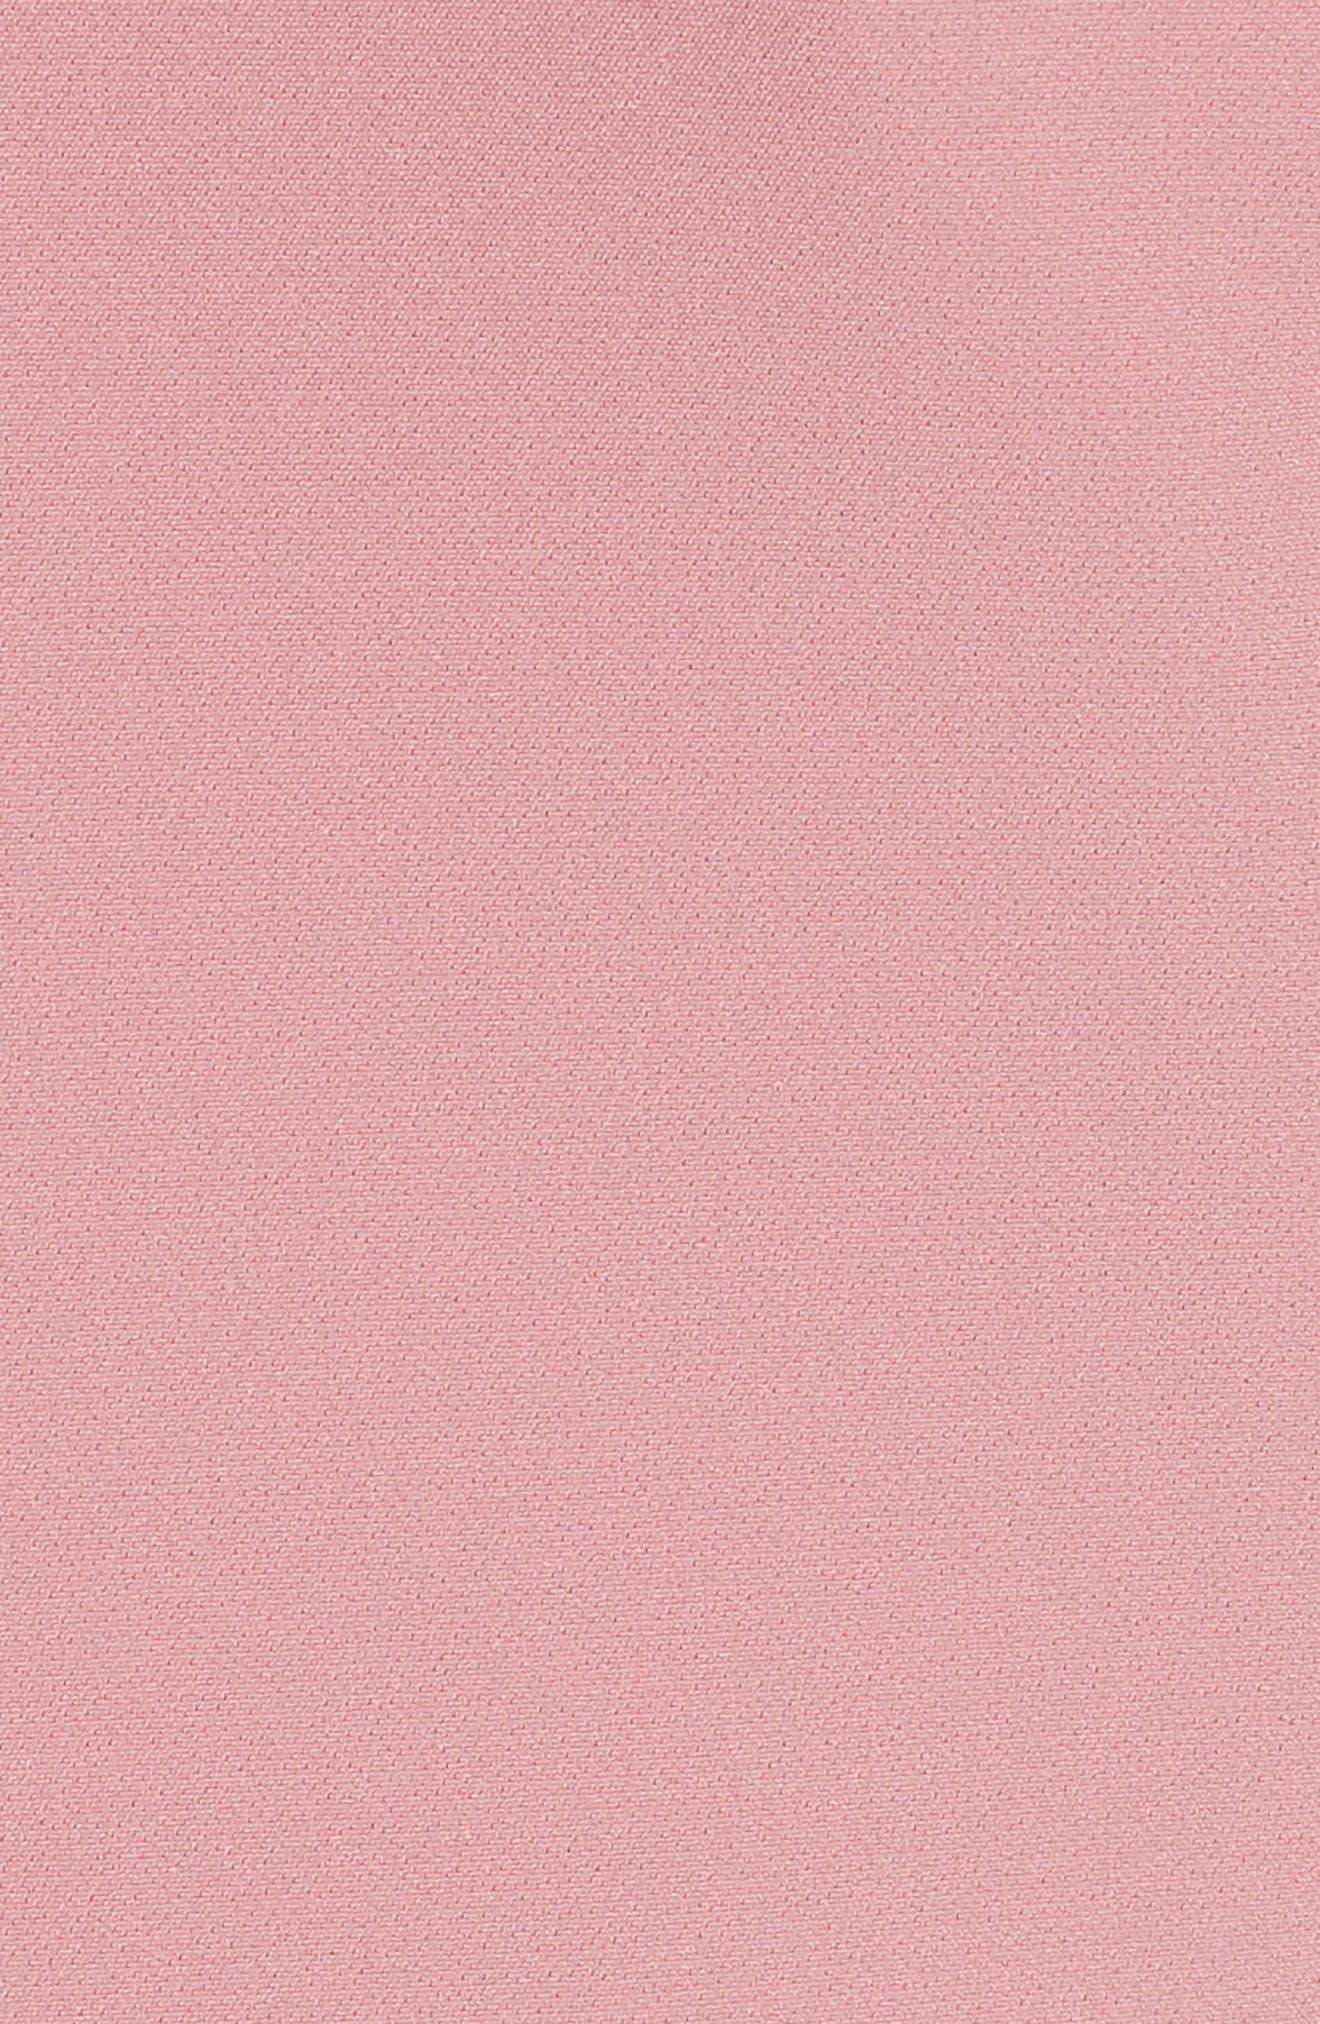 Maggidd Ruffle Waist Pencil Dress,                             Alternate thumbnail 5, color,                             953